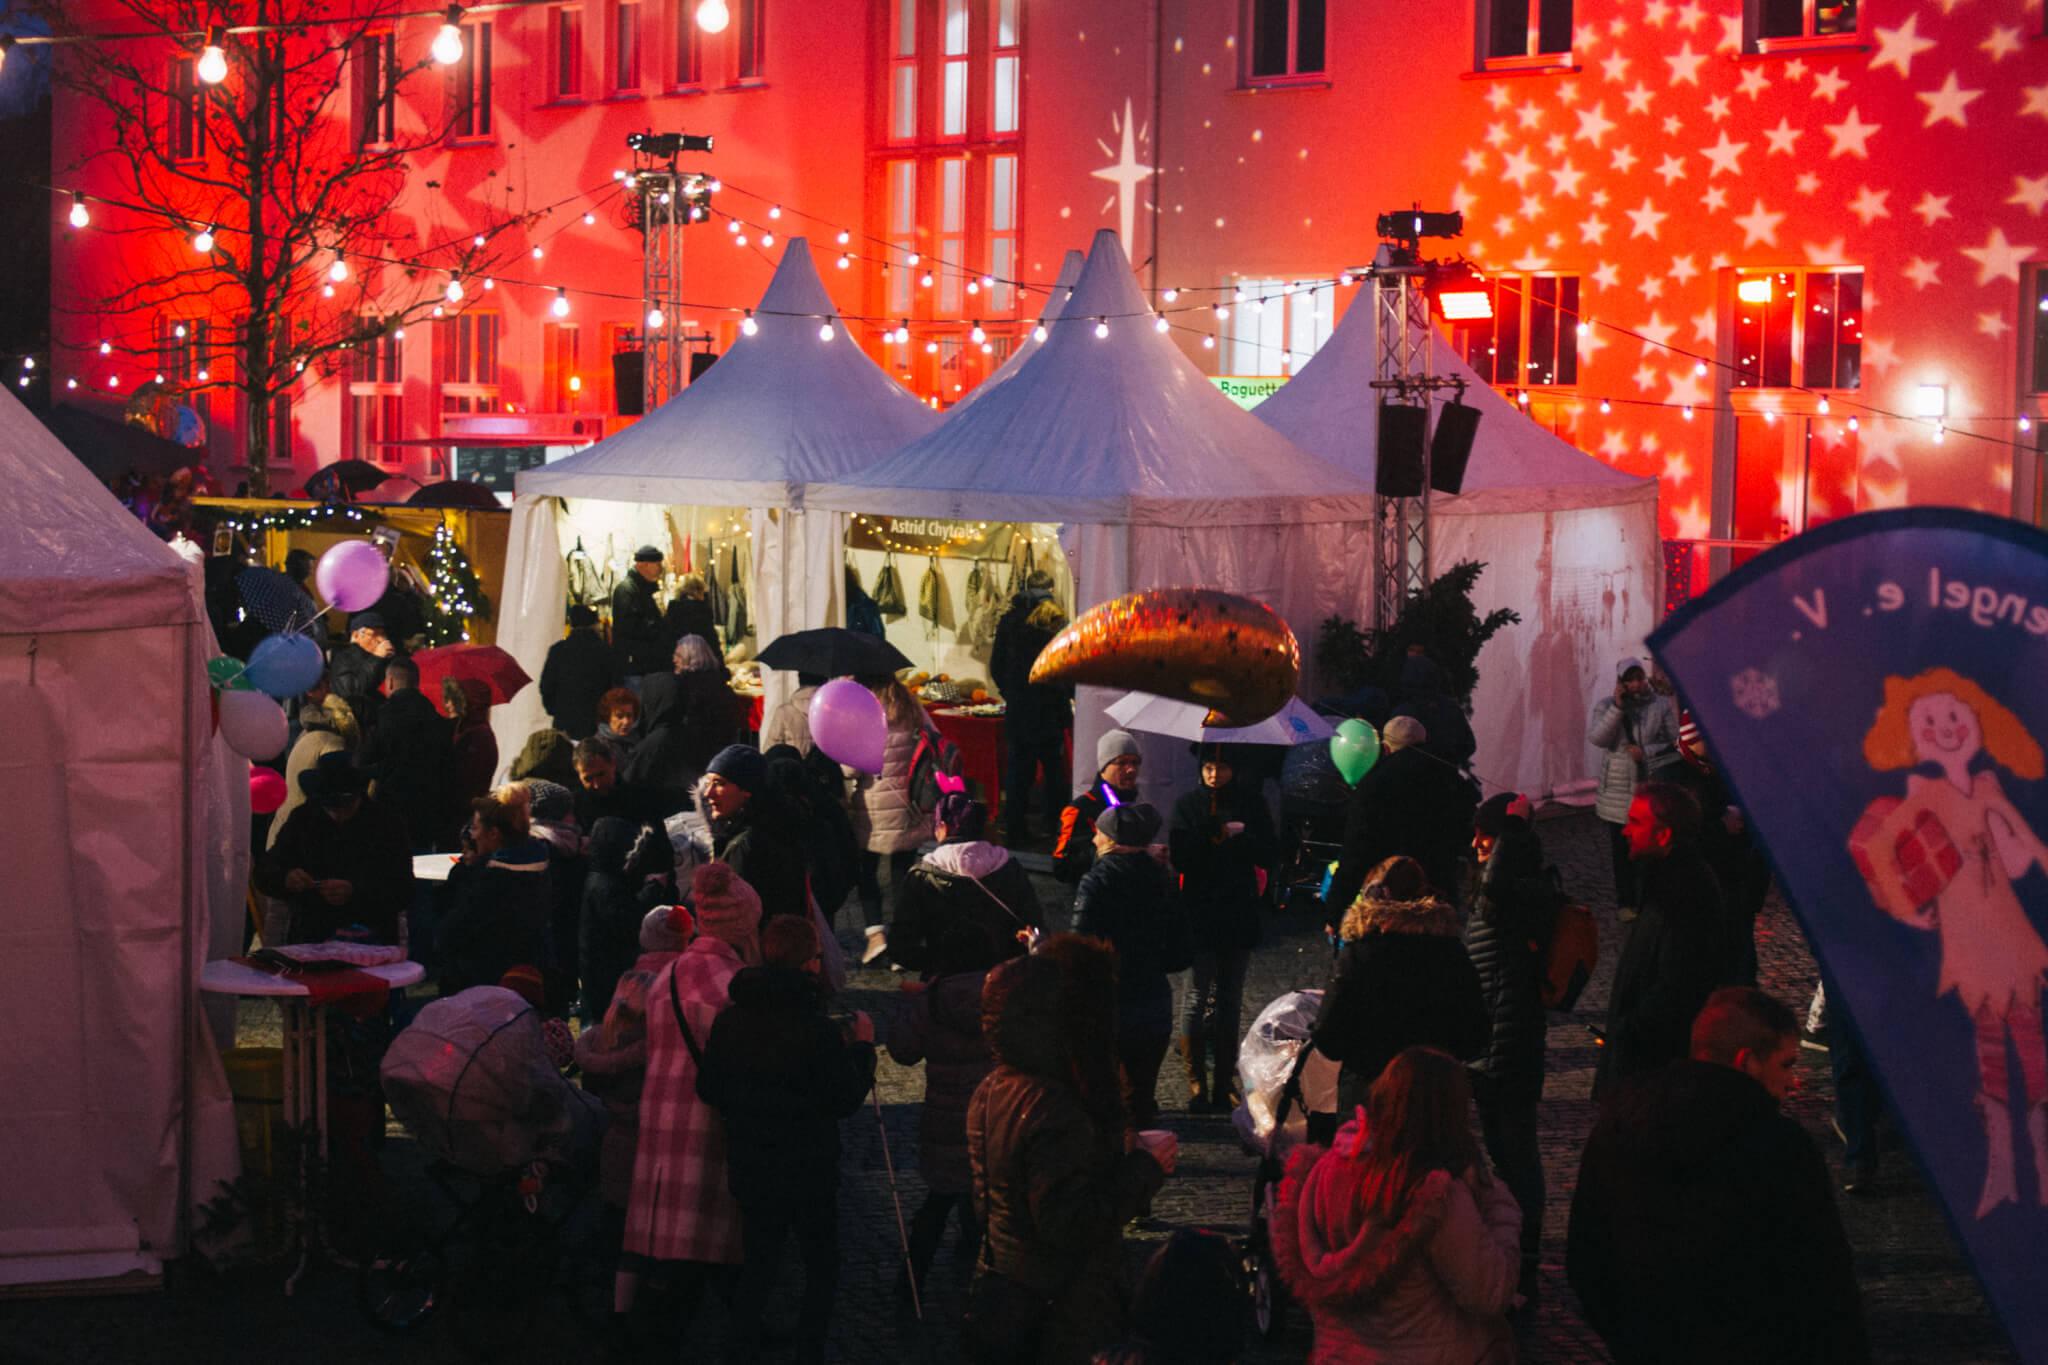 weihnachtsmarkt-in-ludwigsfelde-klubhaushof-5994